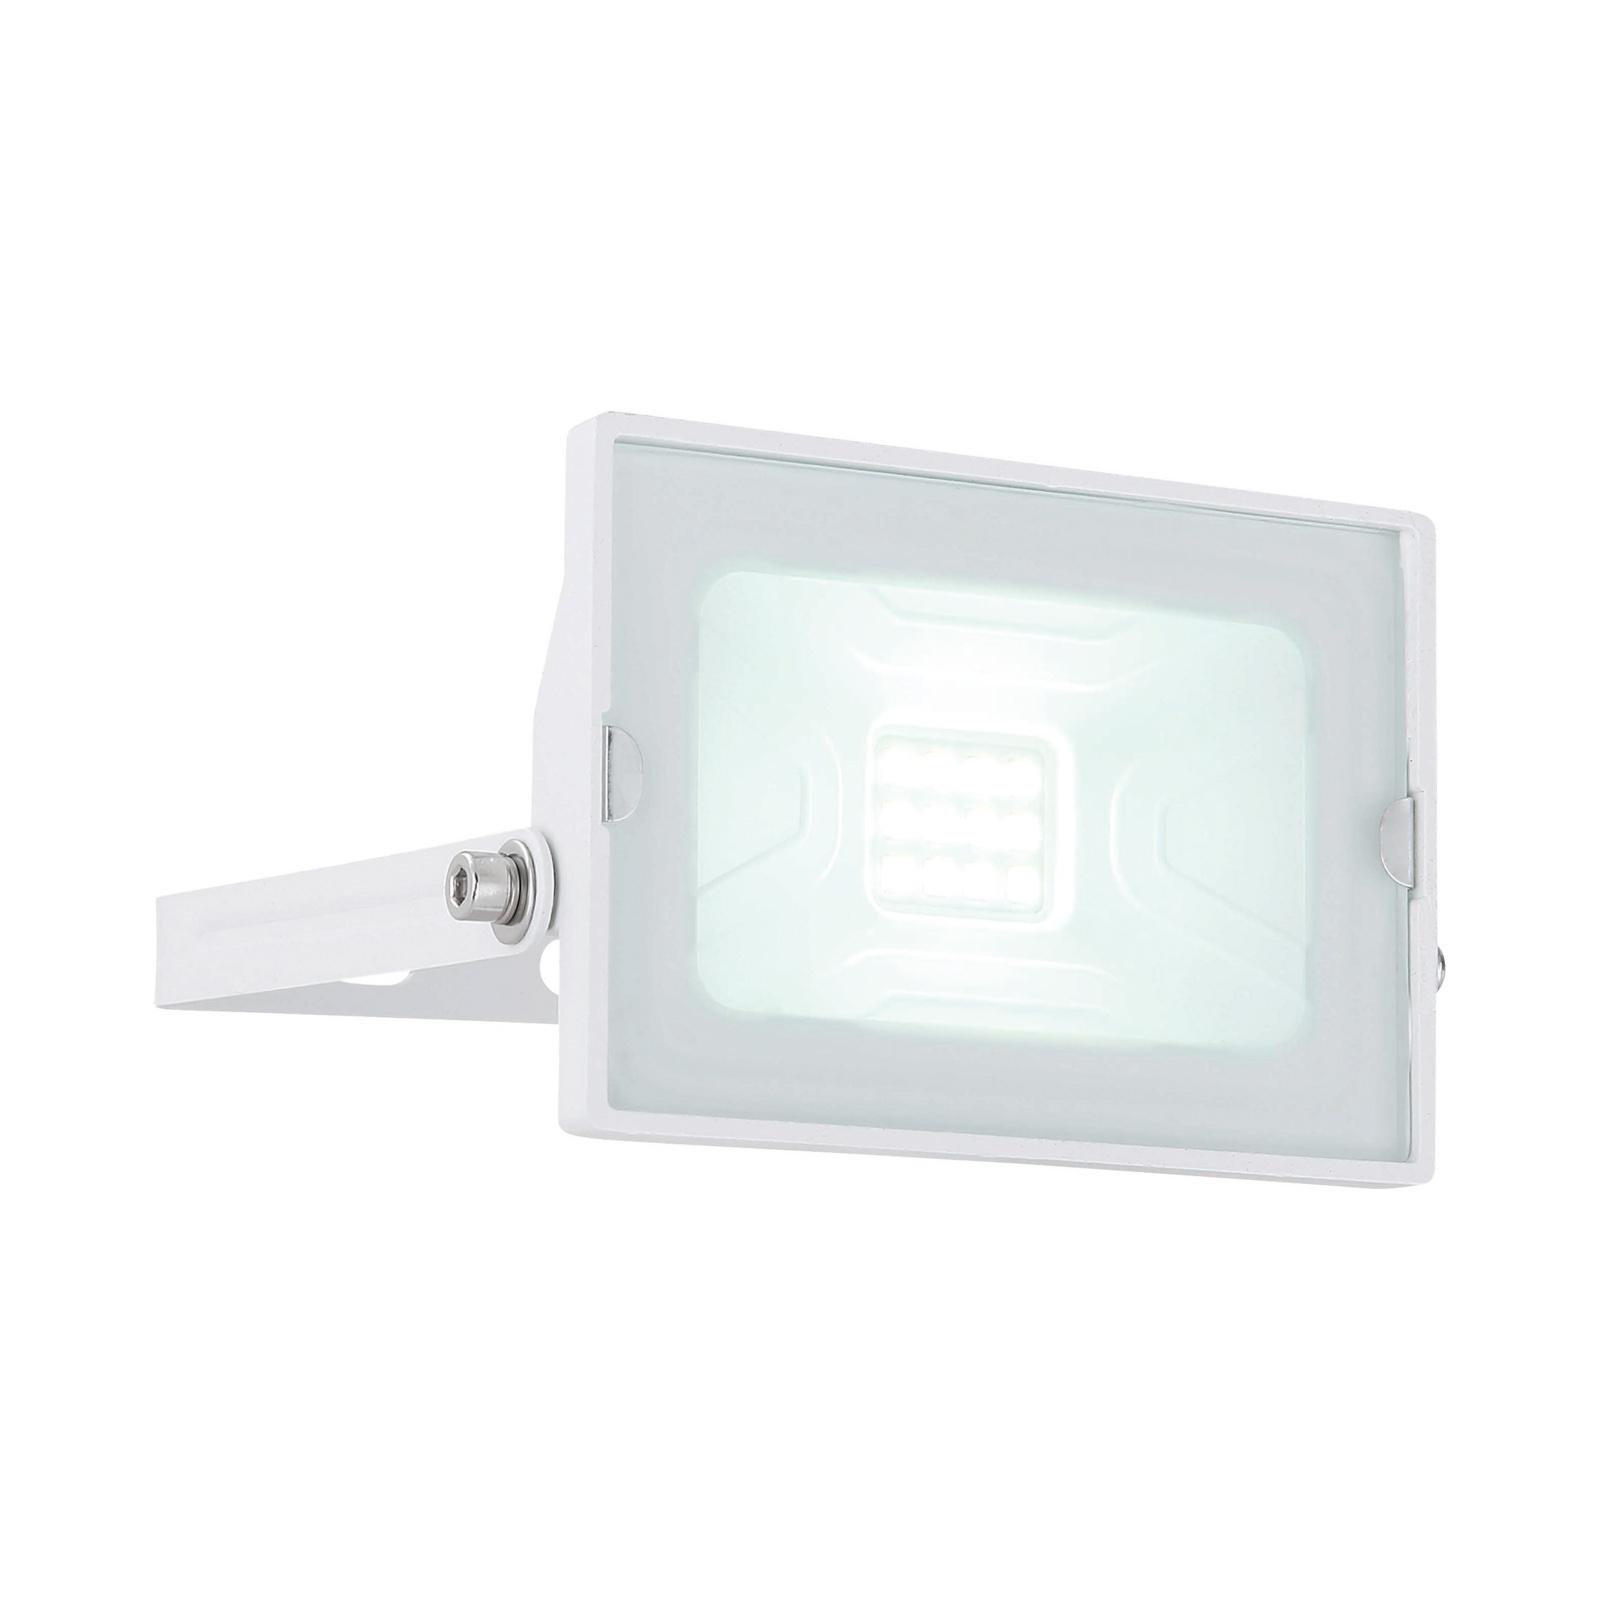 Lindby Aine LED buitenspot wit 6,7 cm